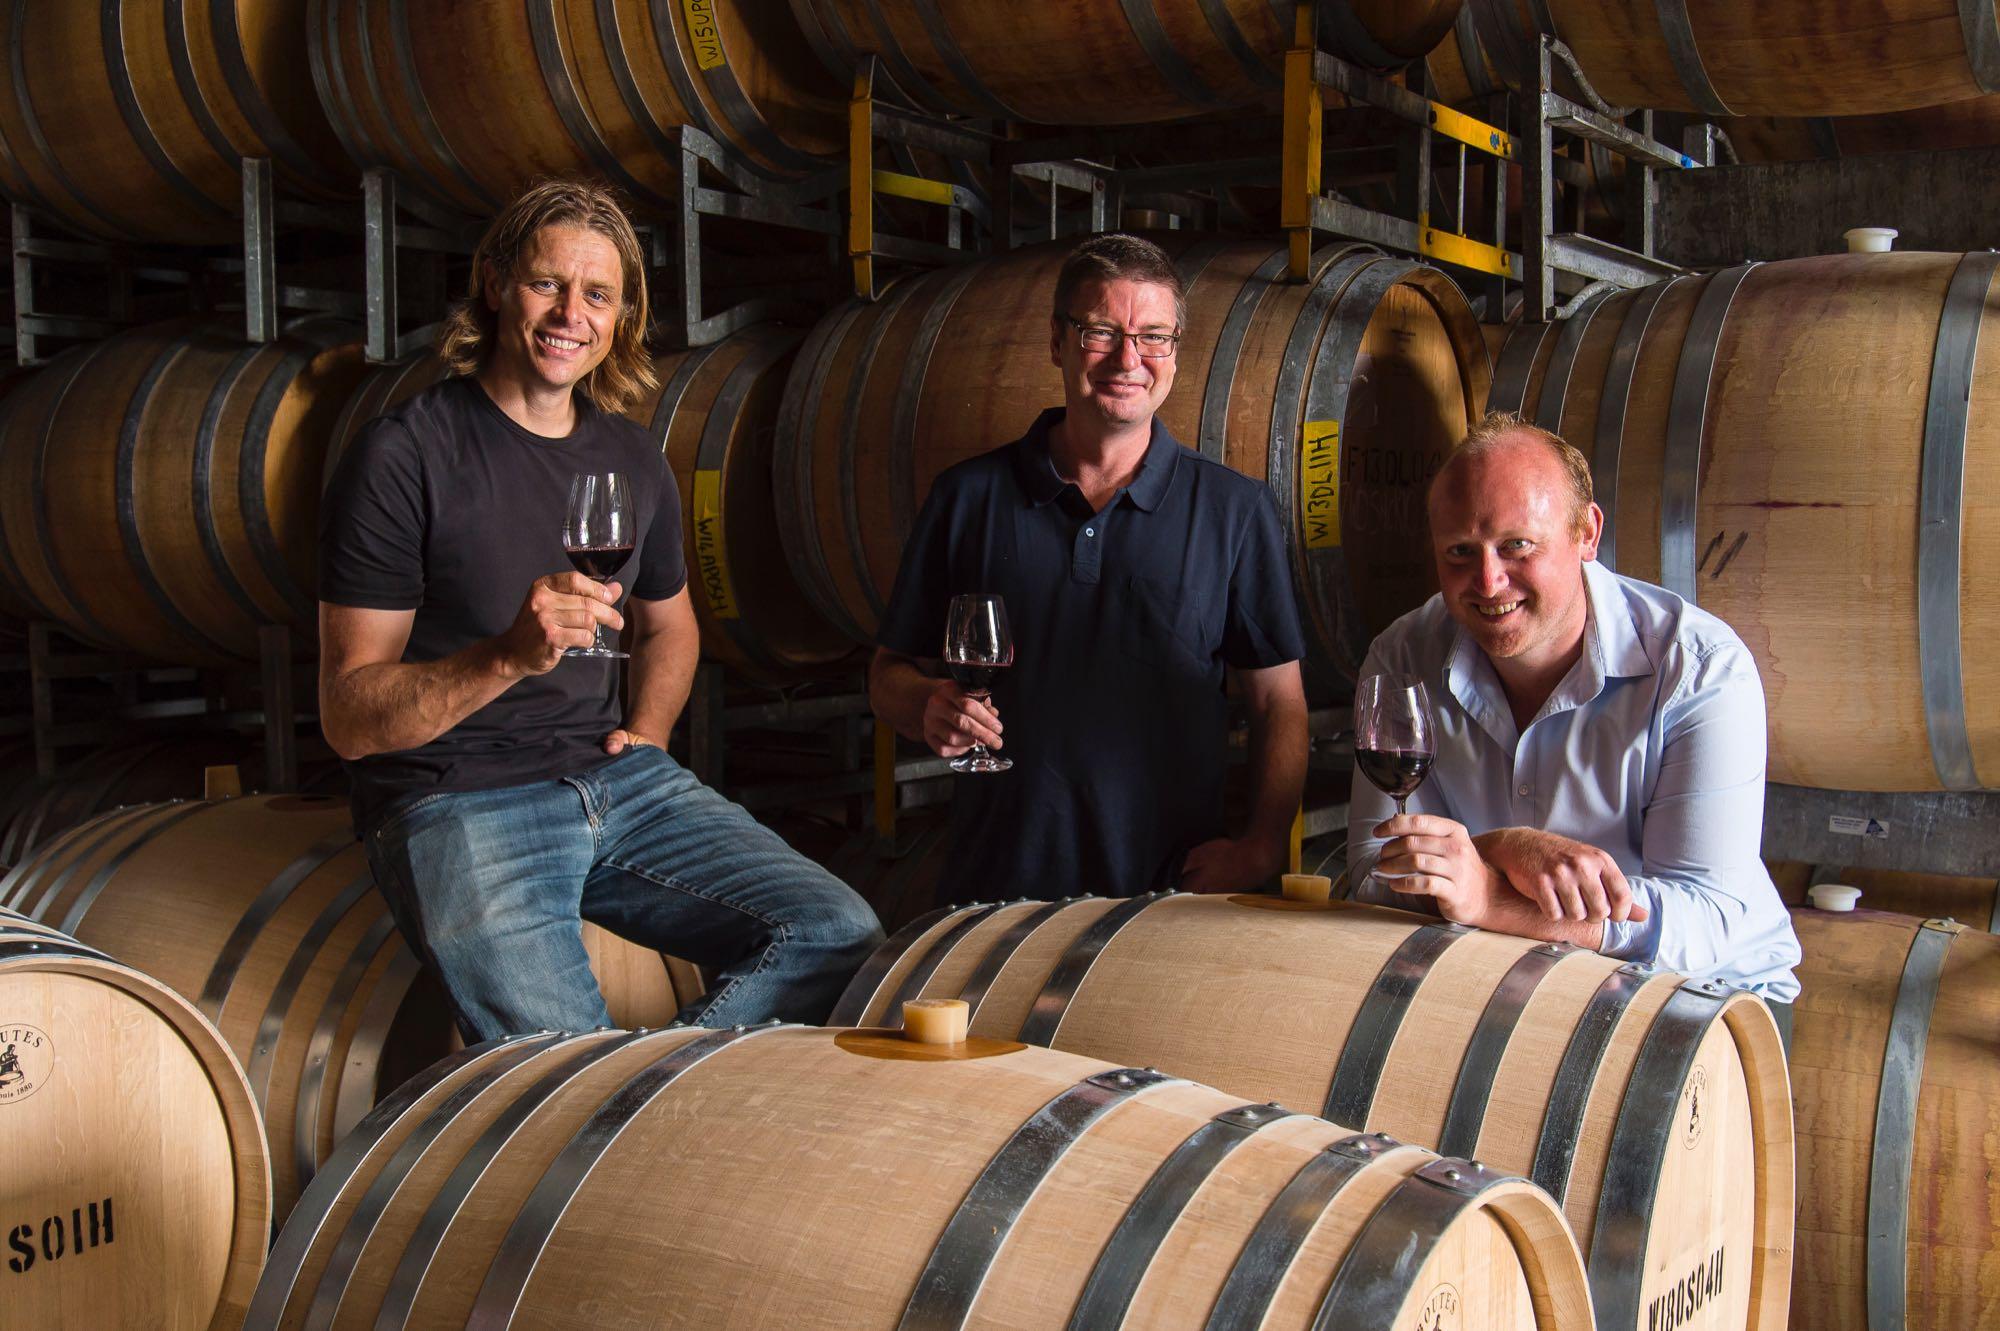 Phil Lehmann, Charles Ormsby & James Lienert in cellar (1)